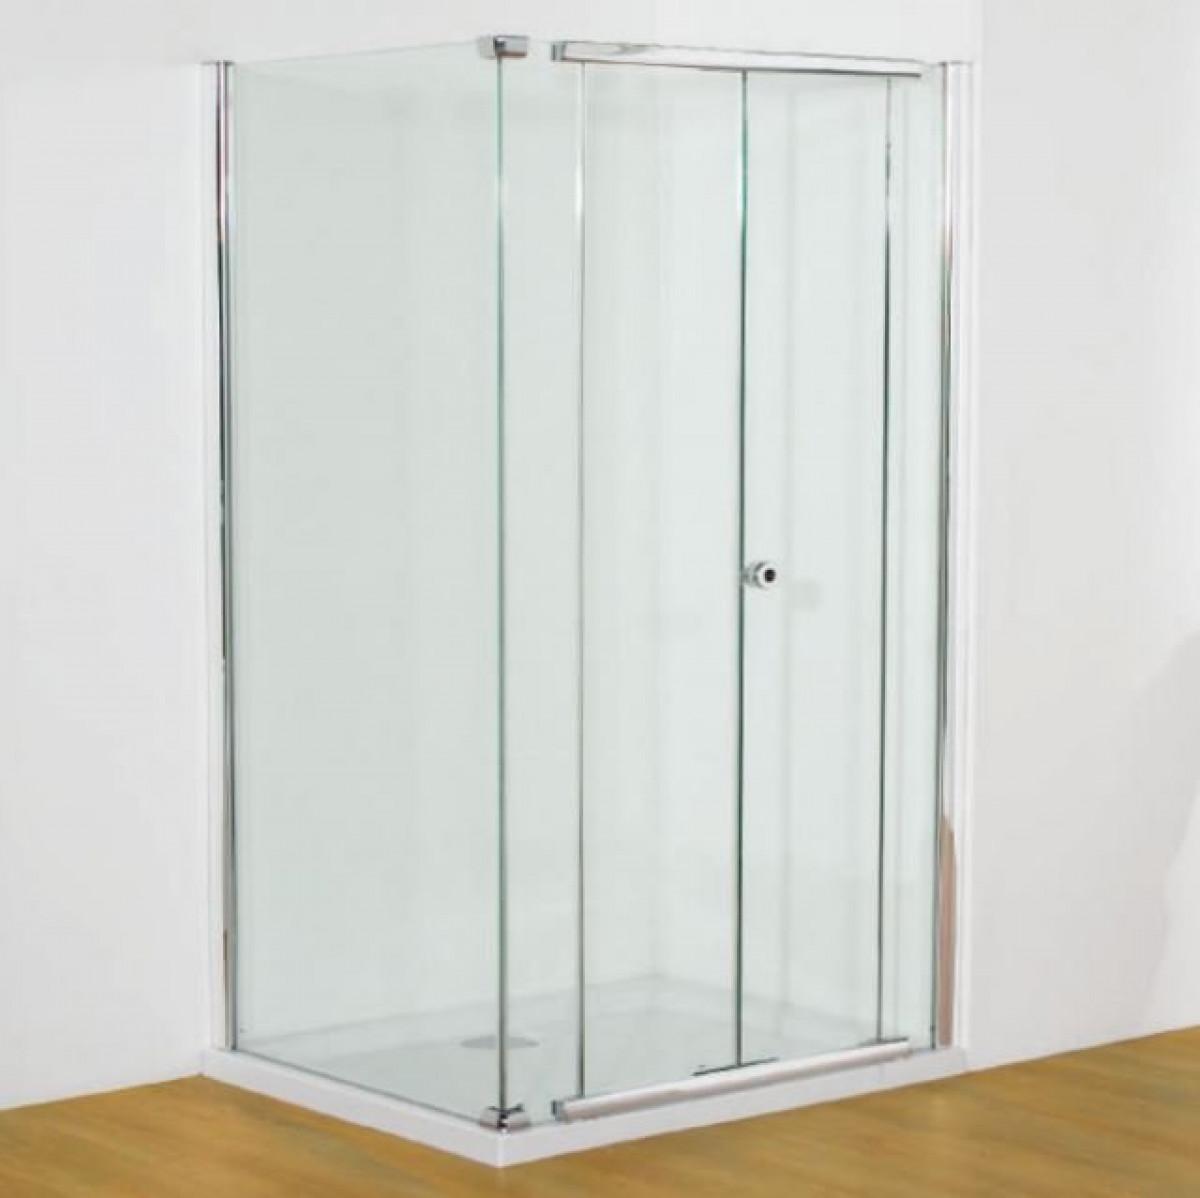 Kudos Infinite 900mm Centre Folding Door Enclosure | 4BF90S -